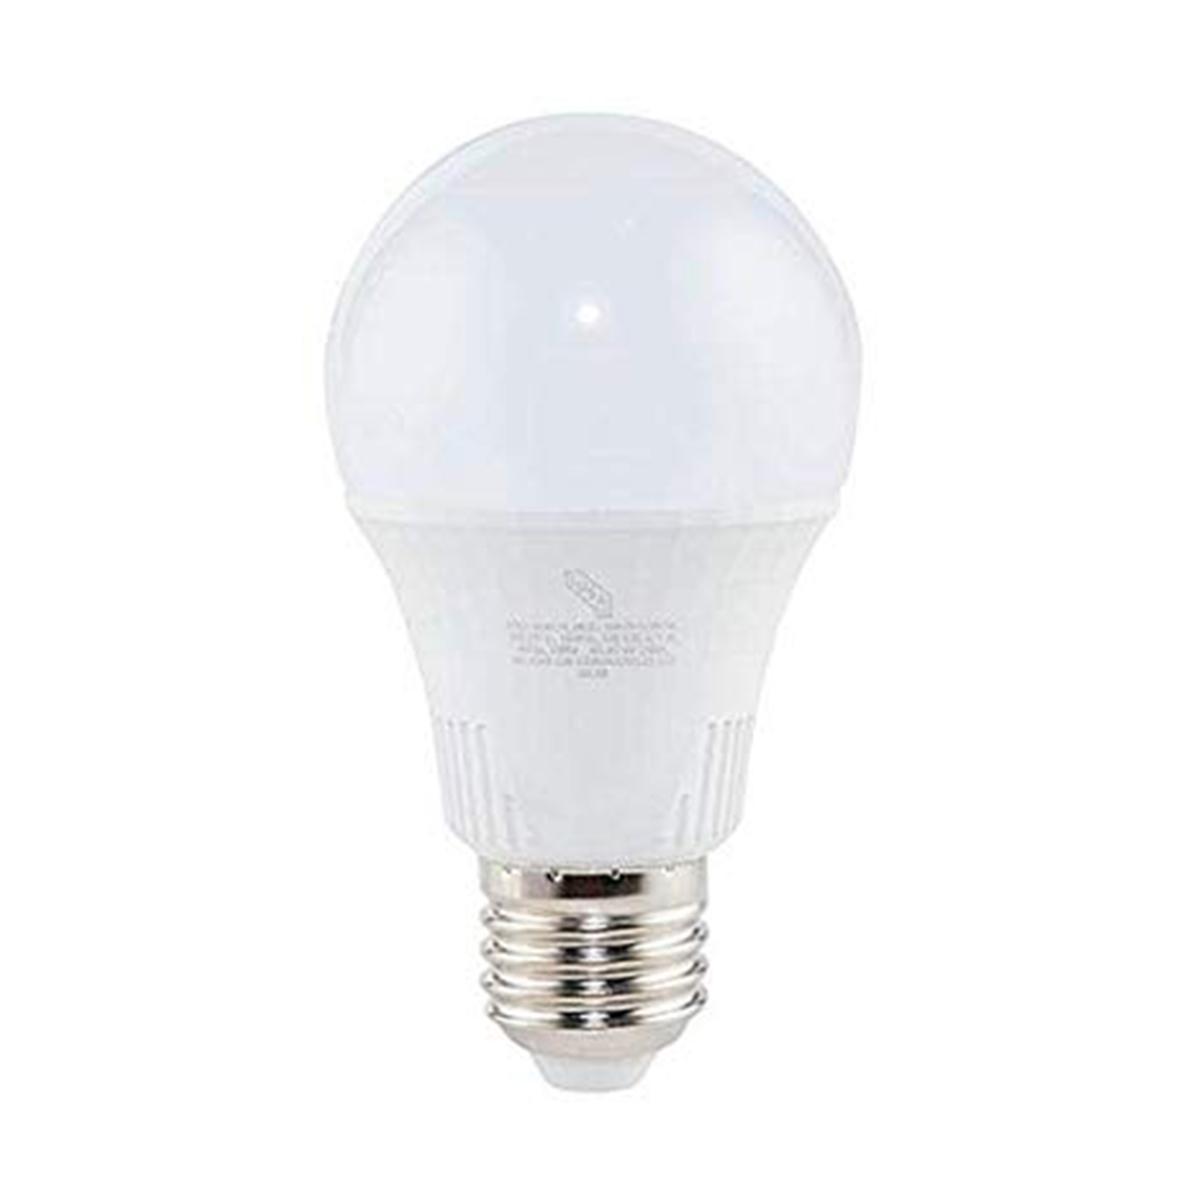 Foco Lampara Led Luz Blanca A19 5W Equivale 40 W 618310 Iusa